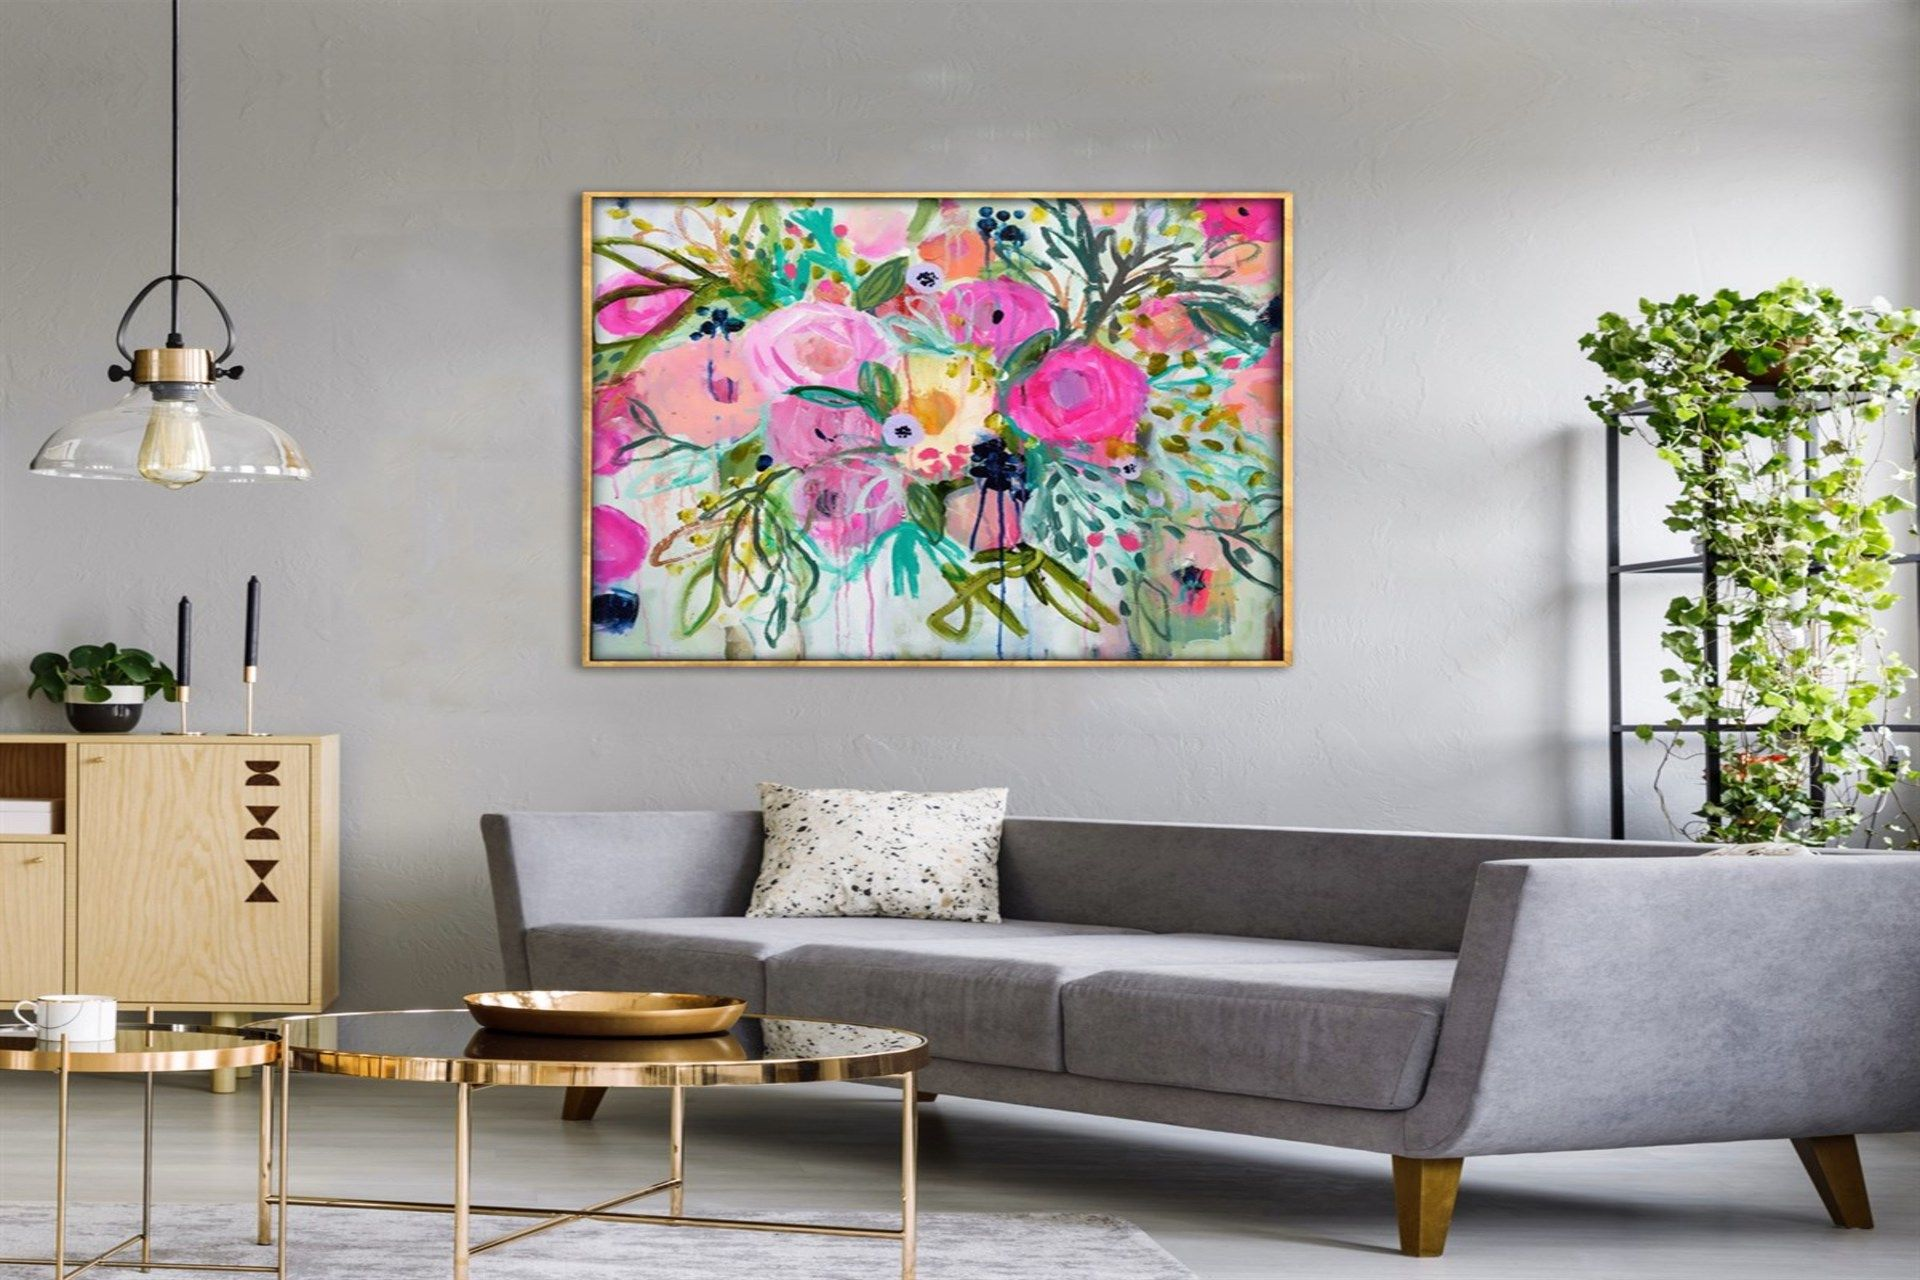 TABLOLİFE ABSTRACT FLOWERS YAĞLI BOYA DOKULU TABLO  90X120 CM